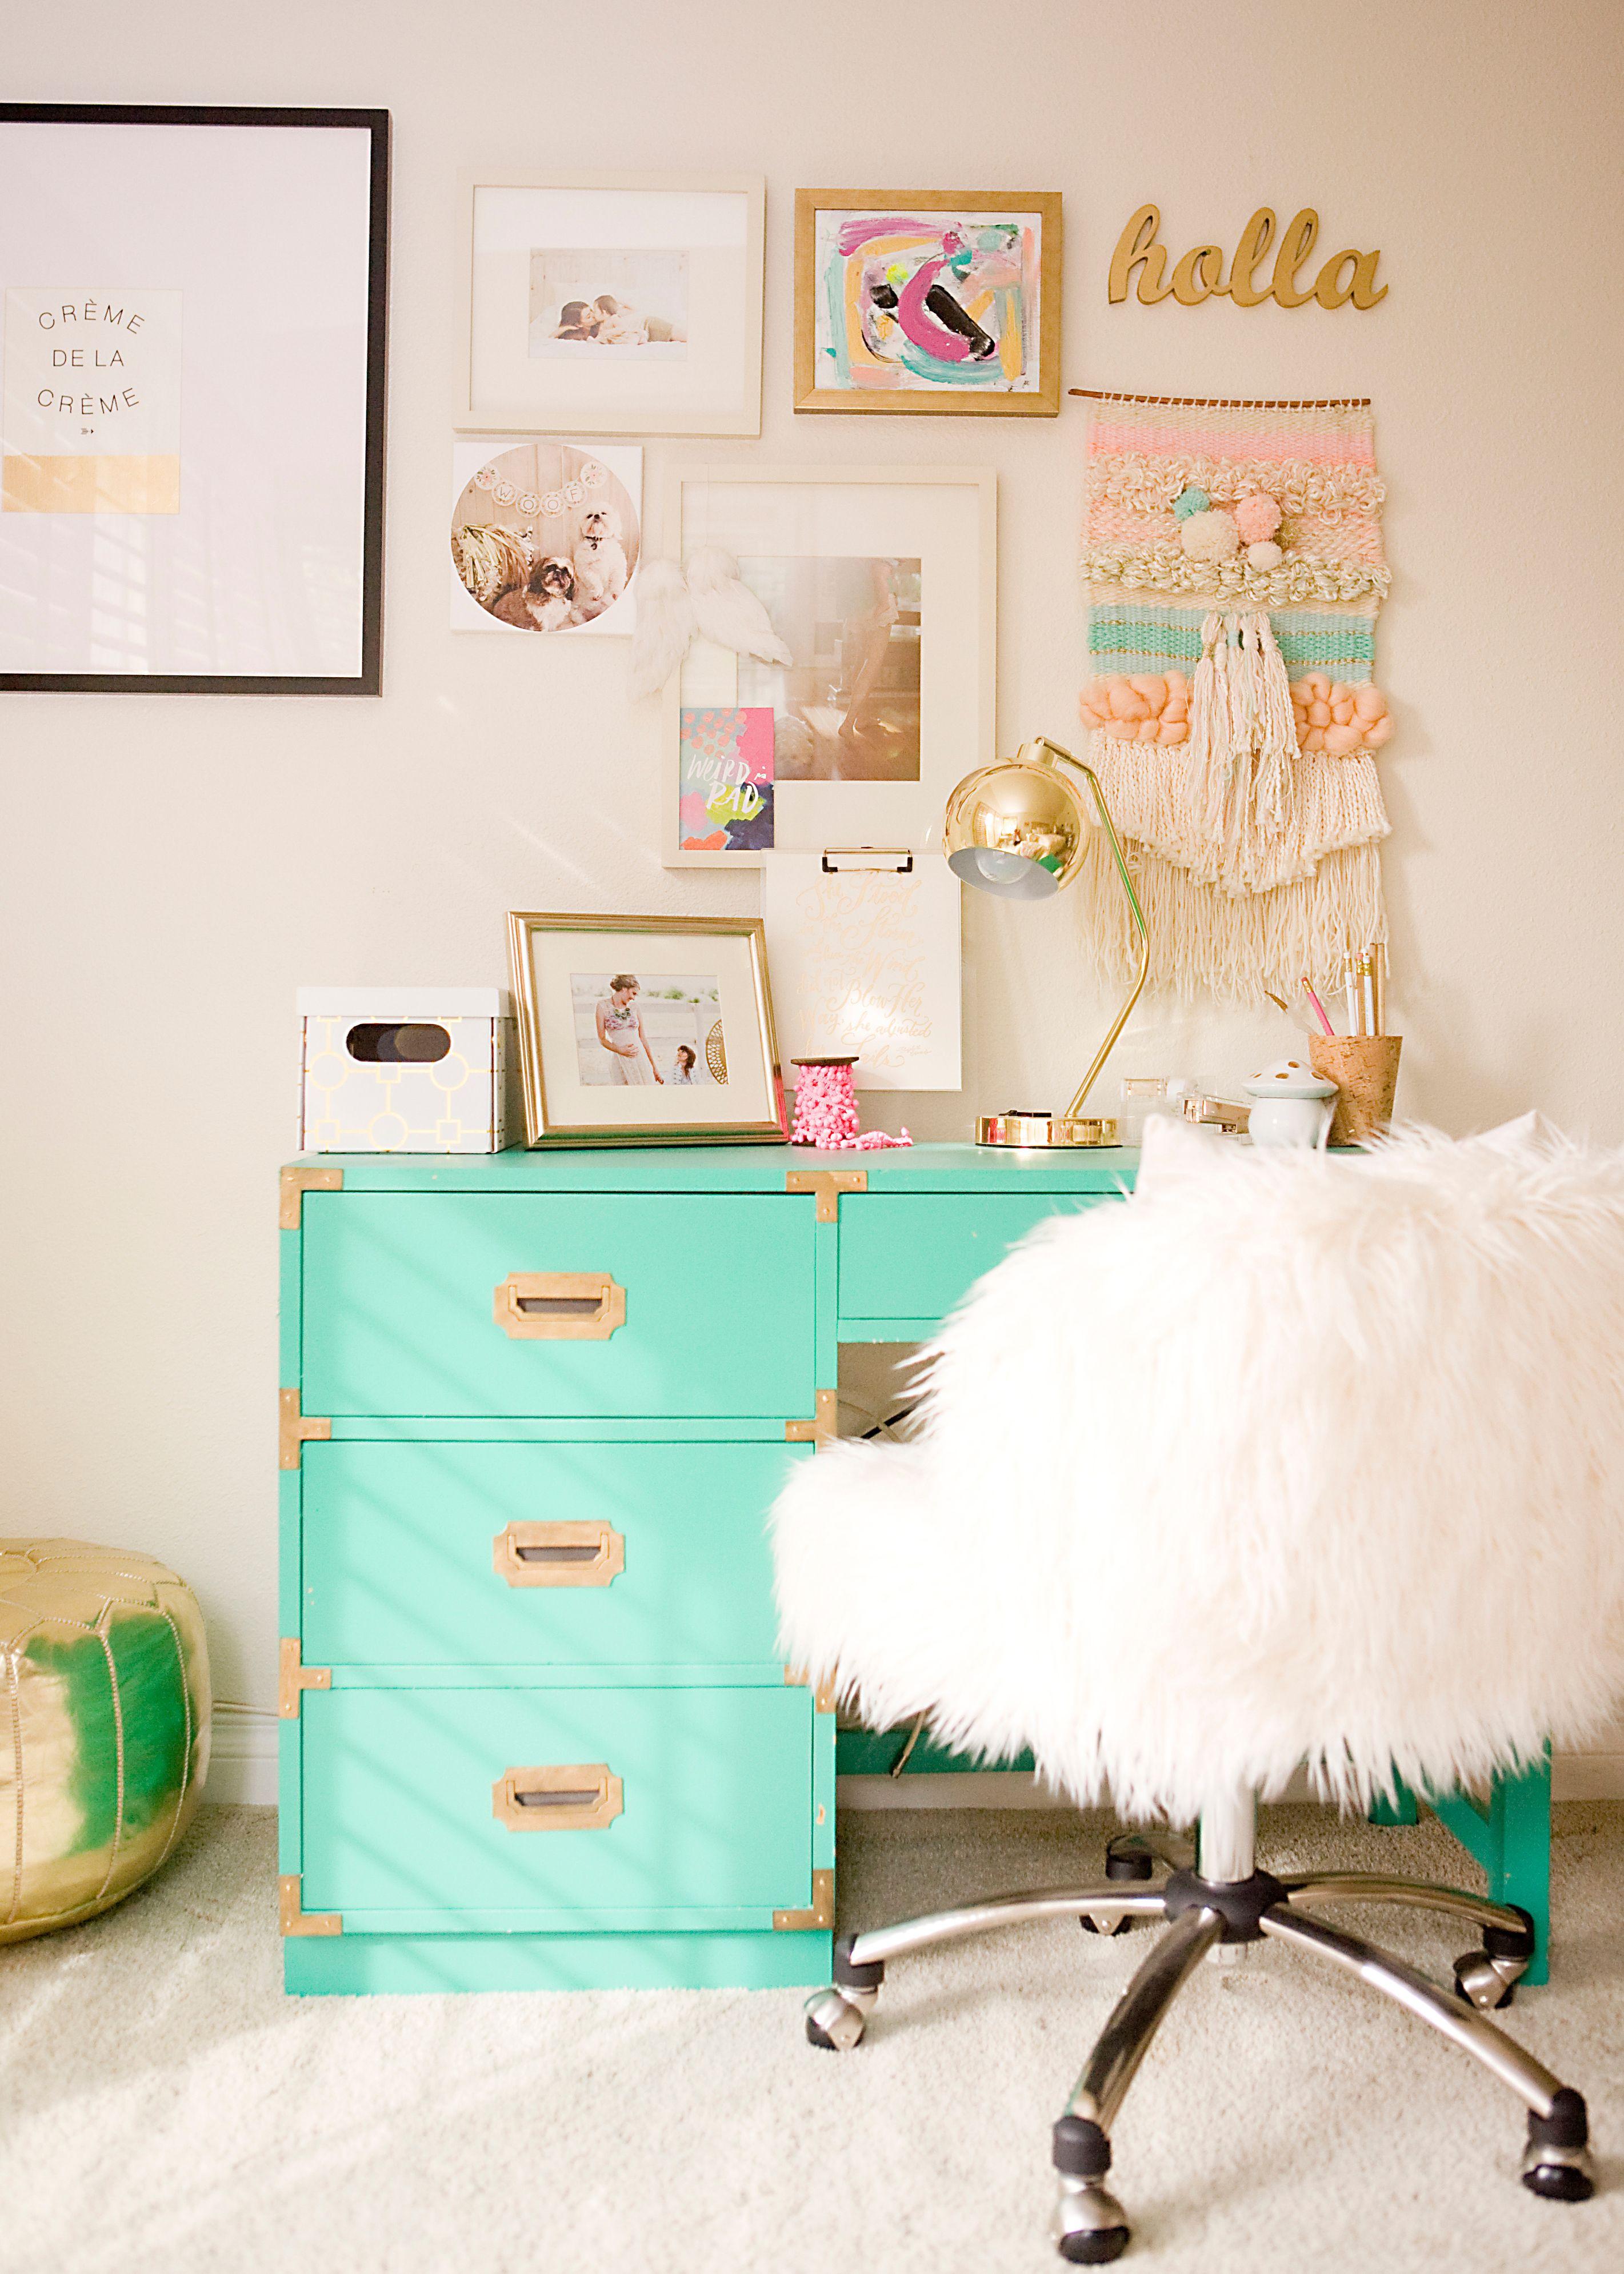 sofa teen teenage girls desks drawers light homework desk bedrooms work bedroom bedding for i with small room part